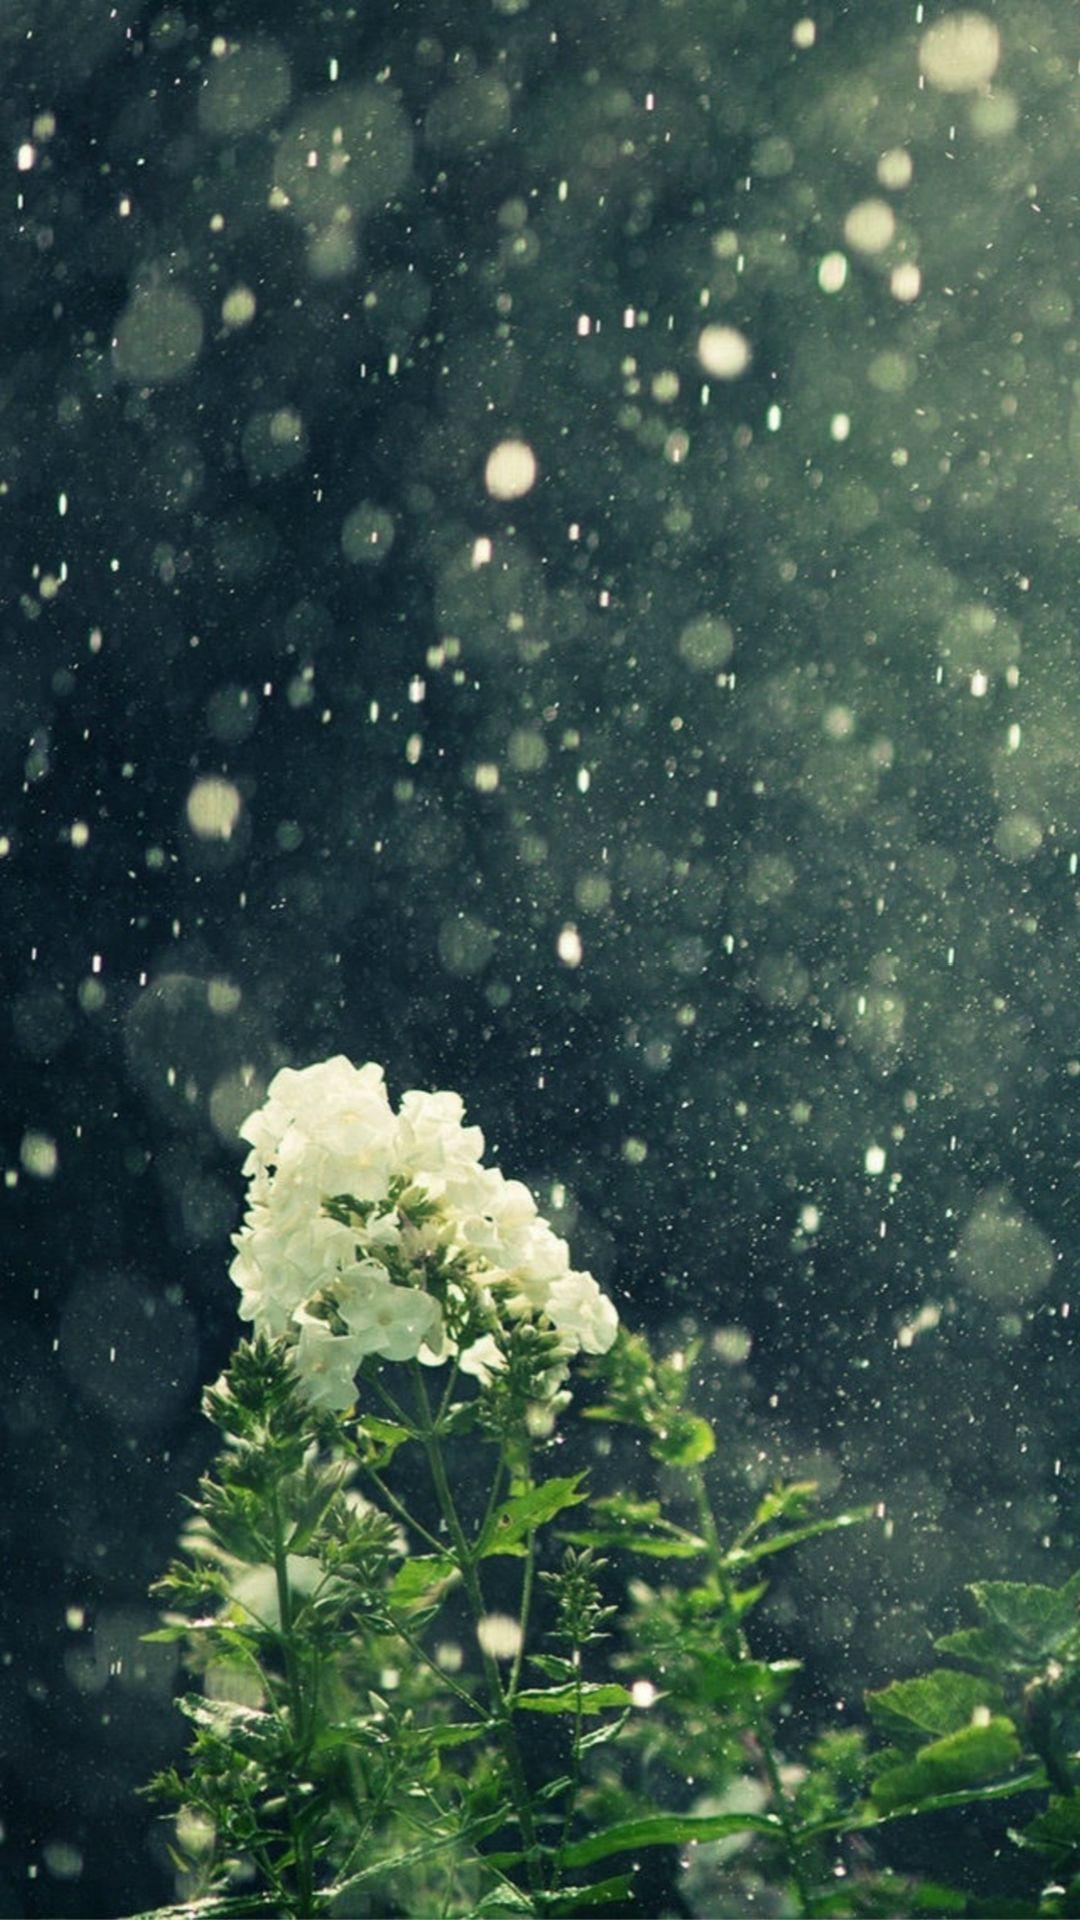 Dreamy Blowing Rain Beautiful White Flower Branch Iphone 6 Plus